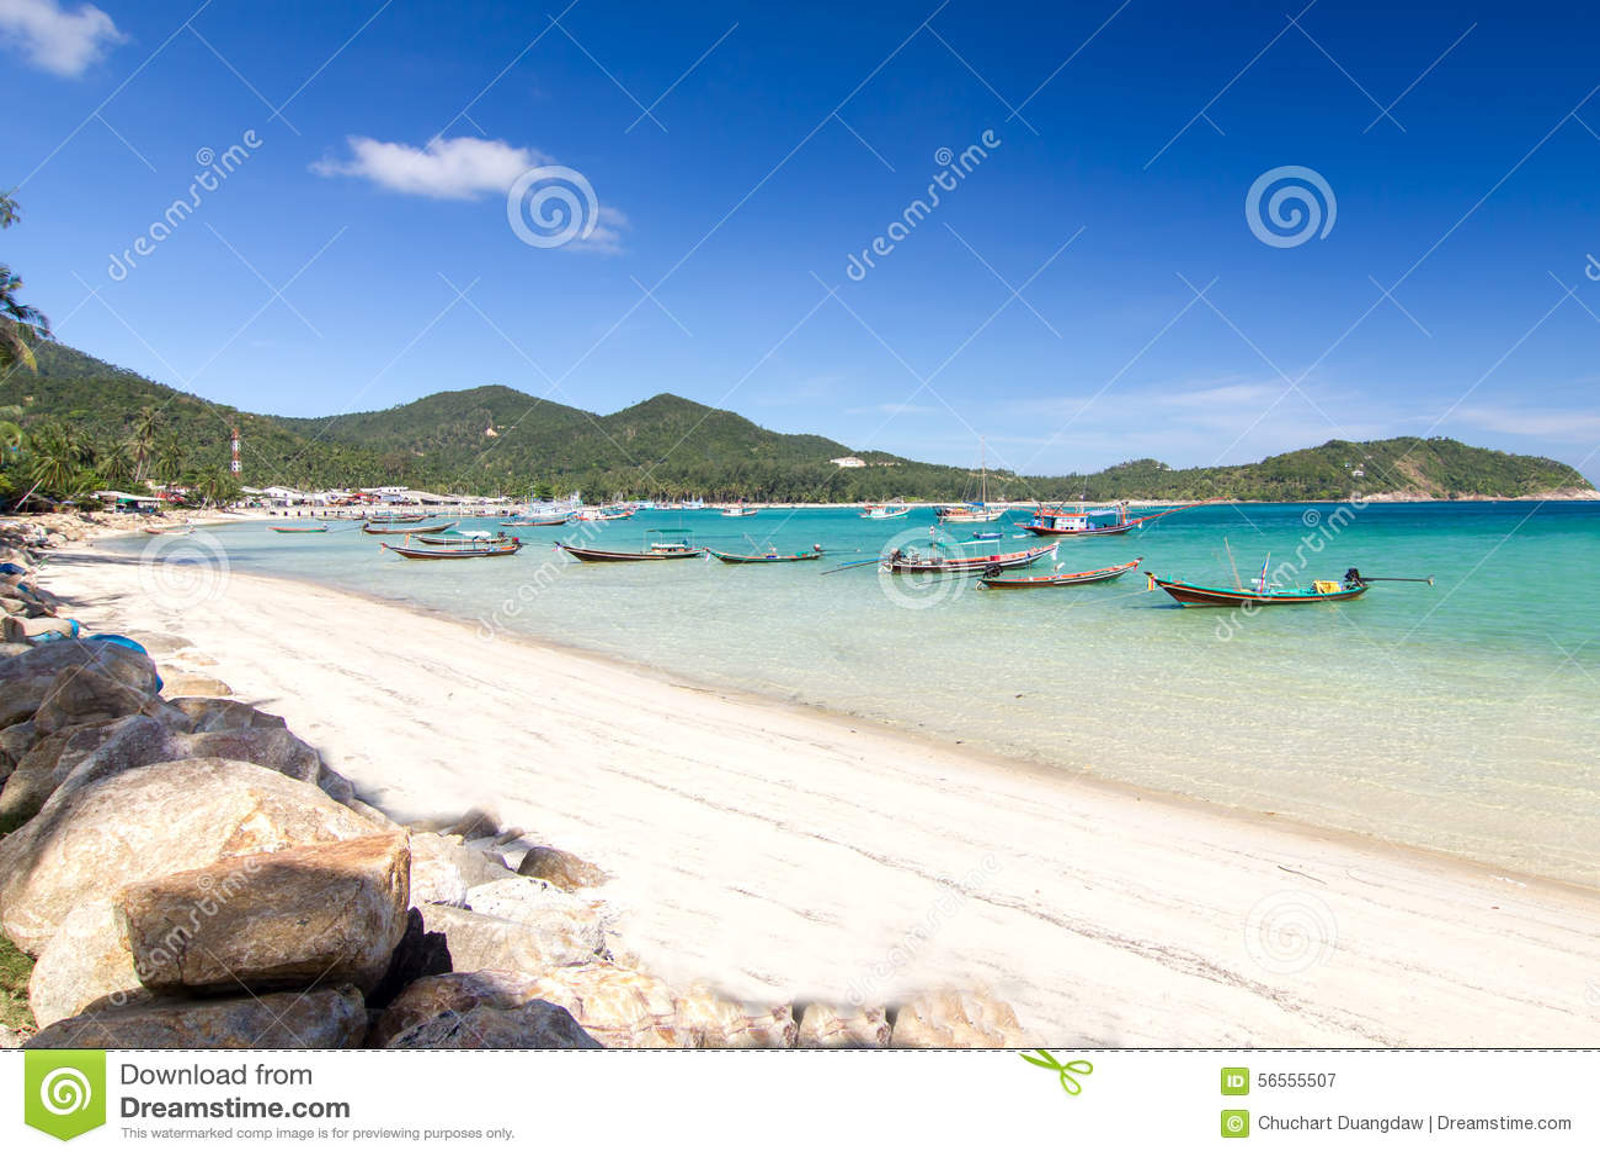 Download Με μακριά ουρά βάρκα και η παραλία και ο μπλε ουρανός Koh Phangan, Sur Στοκ Εικόνα - εικόνα από νησί, πορτοκάλι: 56555507